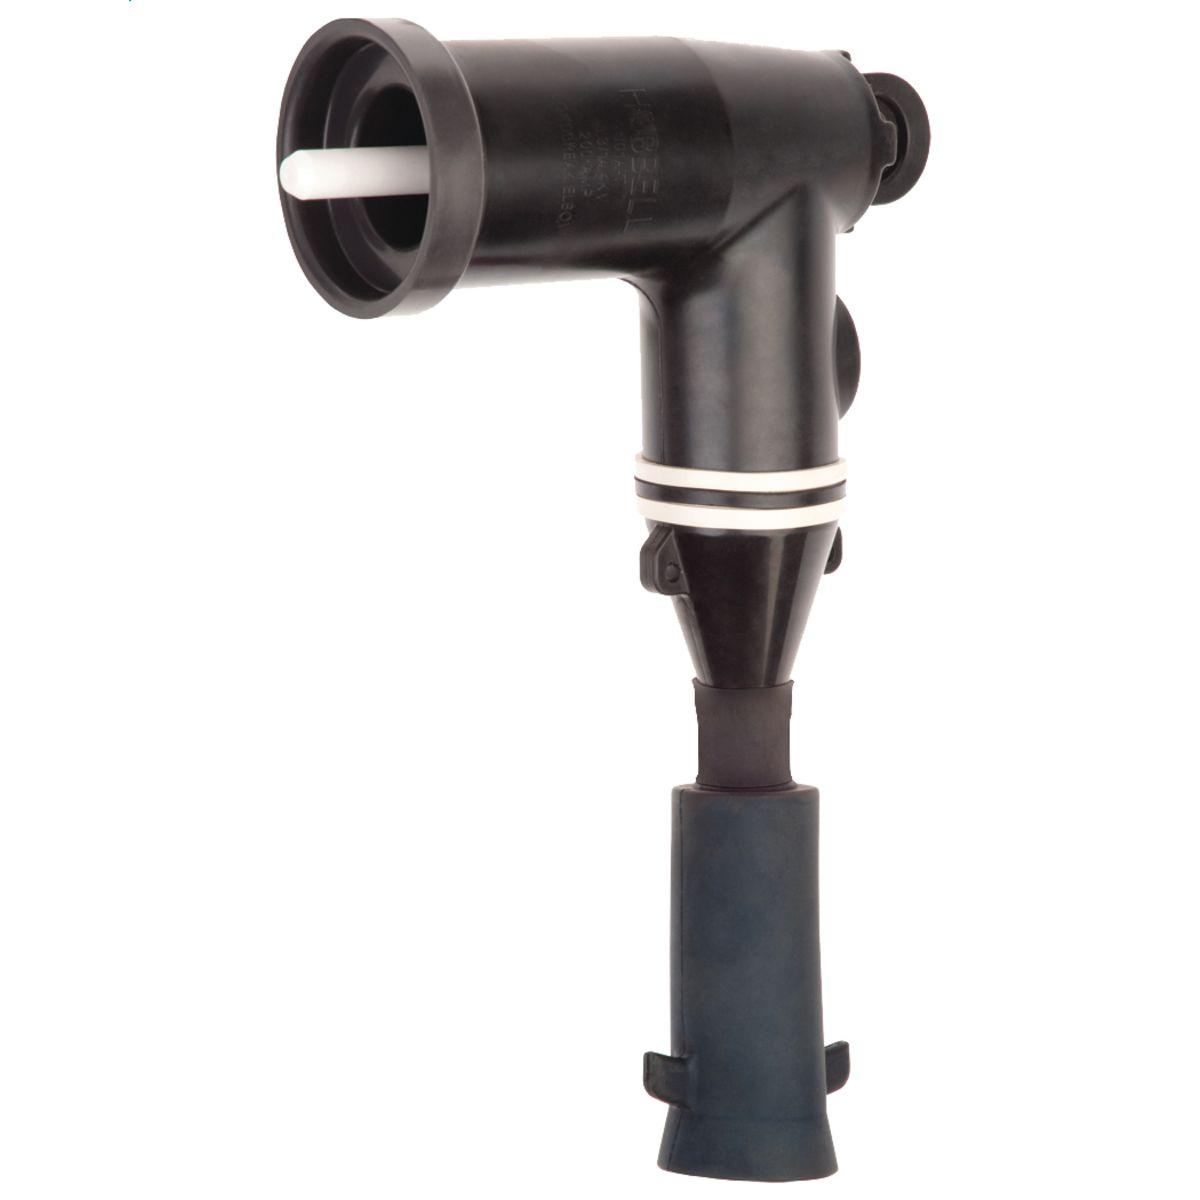 Load Break Elbow Brand Hubbell Power Systems